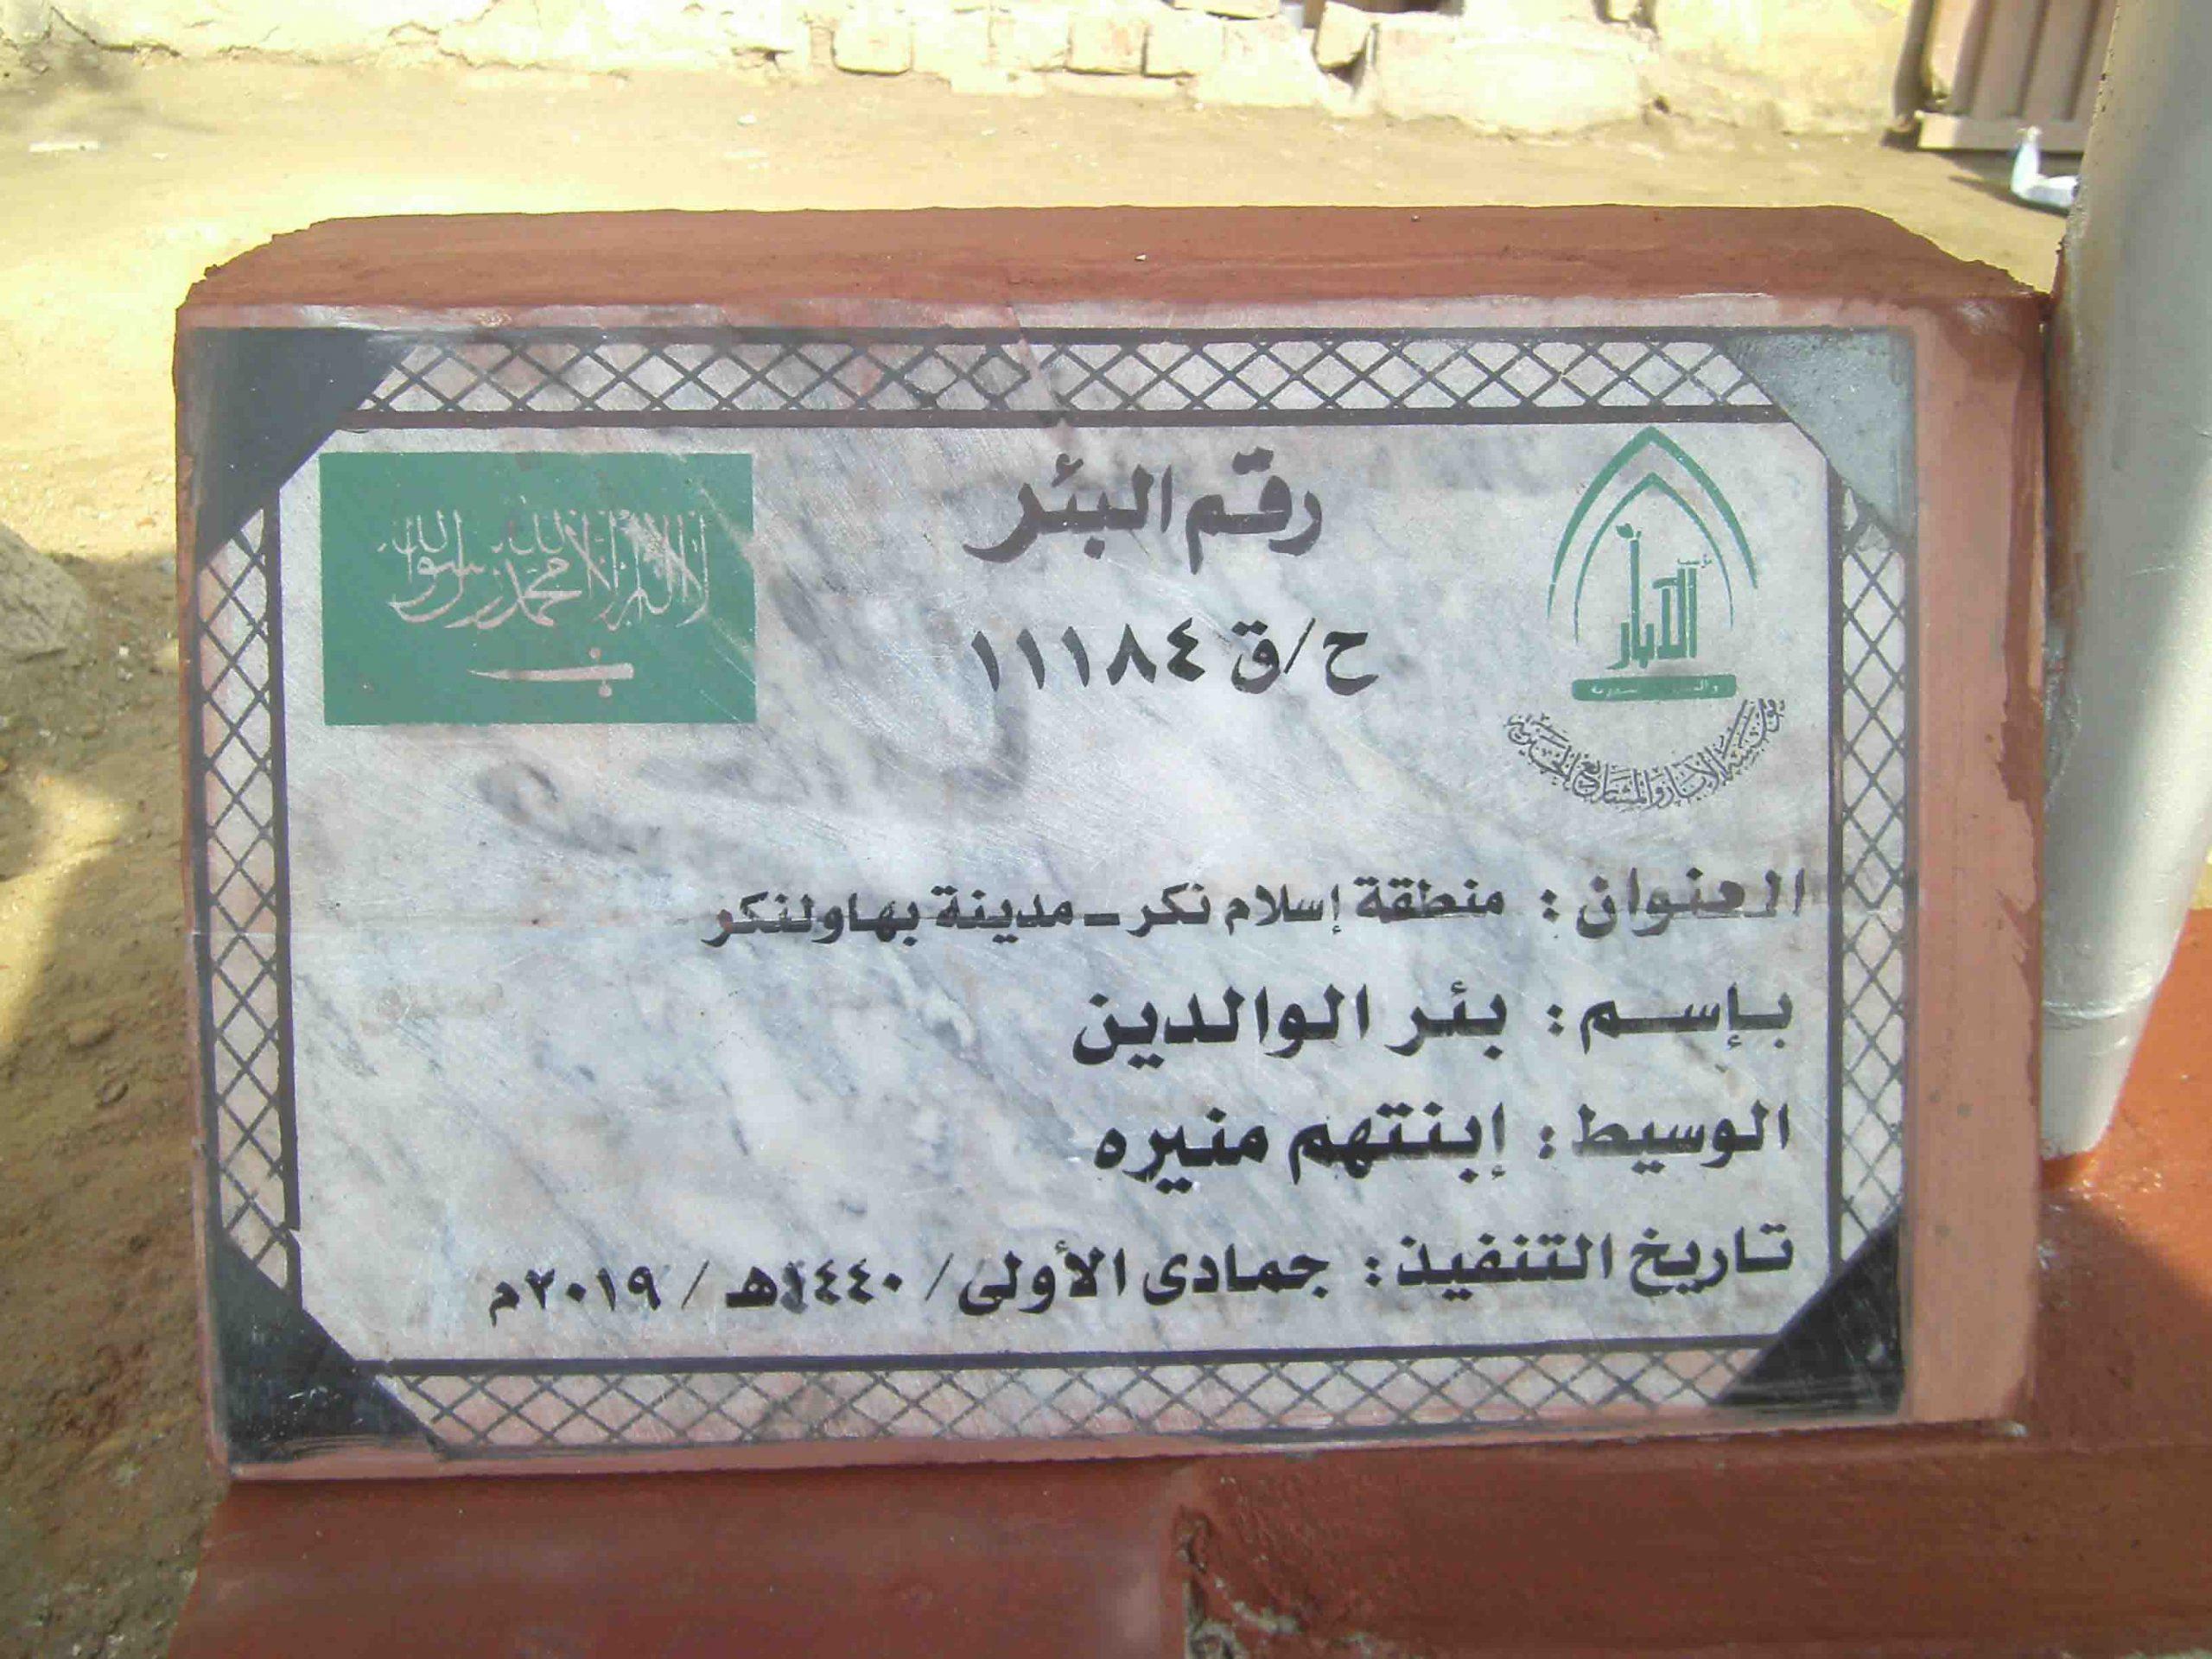 Photo of حفر بئر باسم/ بئر الوالدين  (ح/ق 11184)